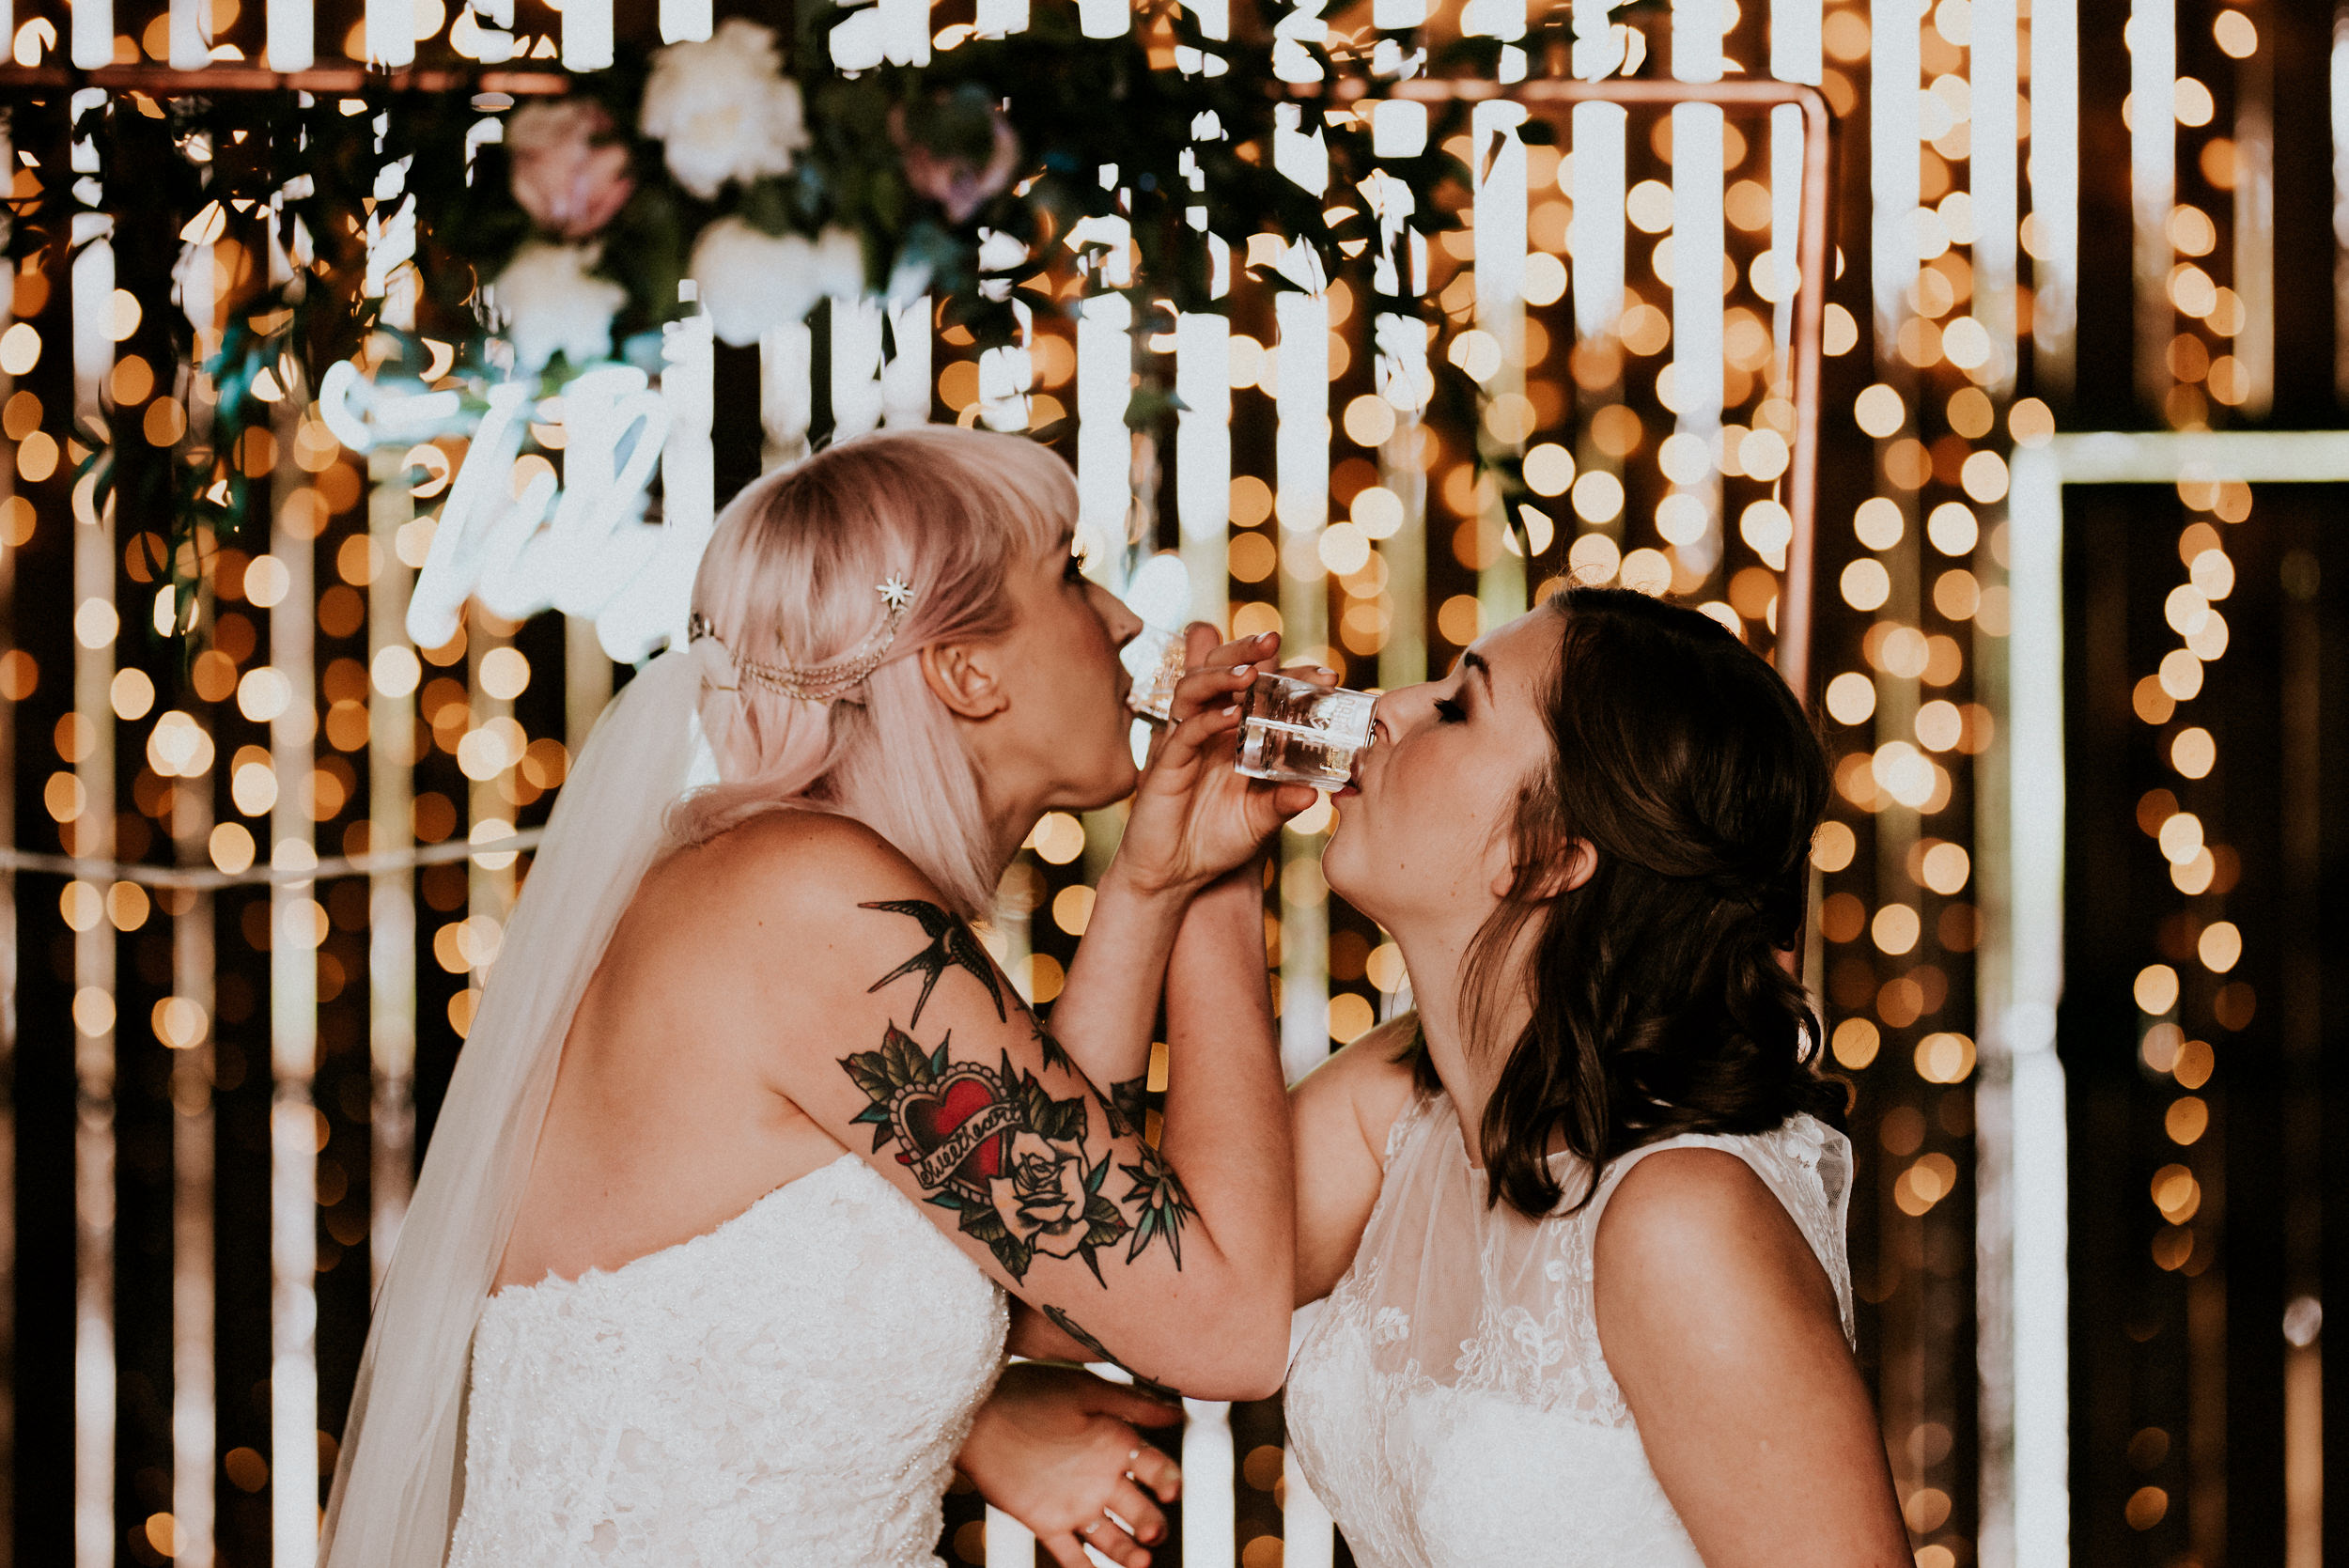 Deepdale-Farm-Wedding-Photos-Shutter-Go-Click-Alternative-Yorkshire-Wedding-Photographer-44.jpg